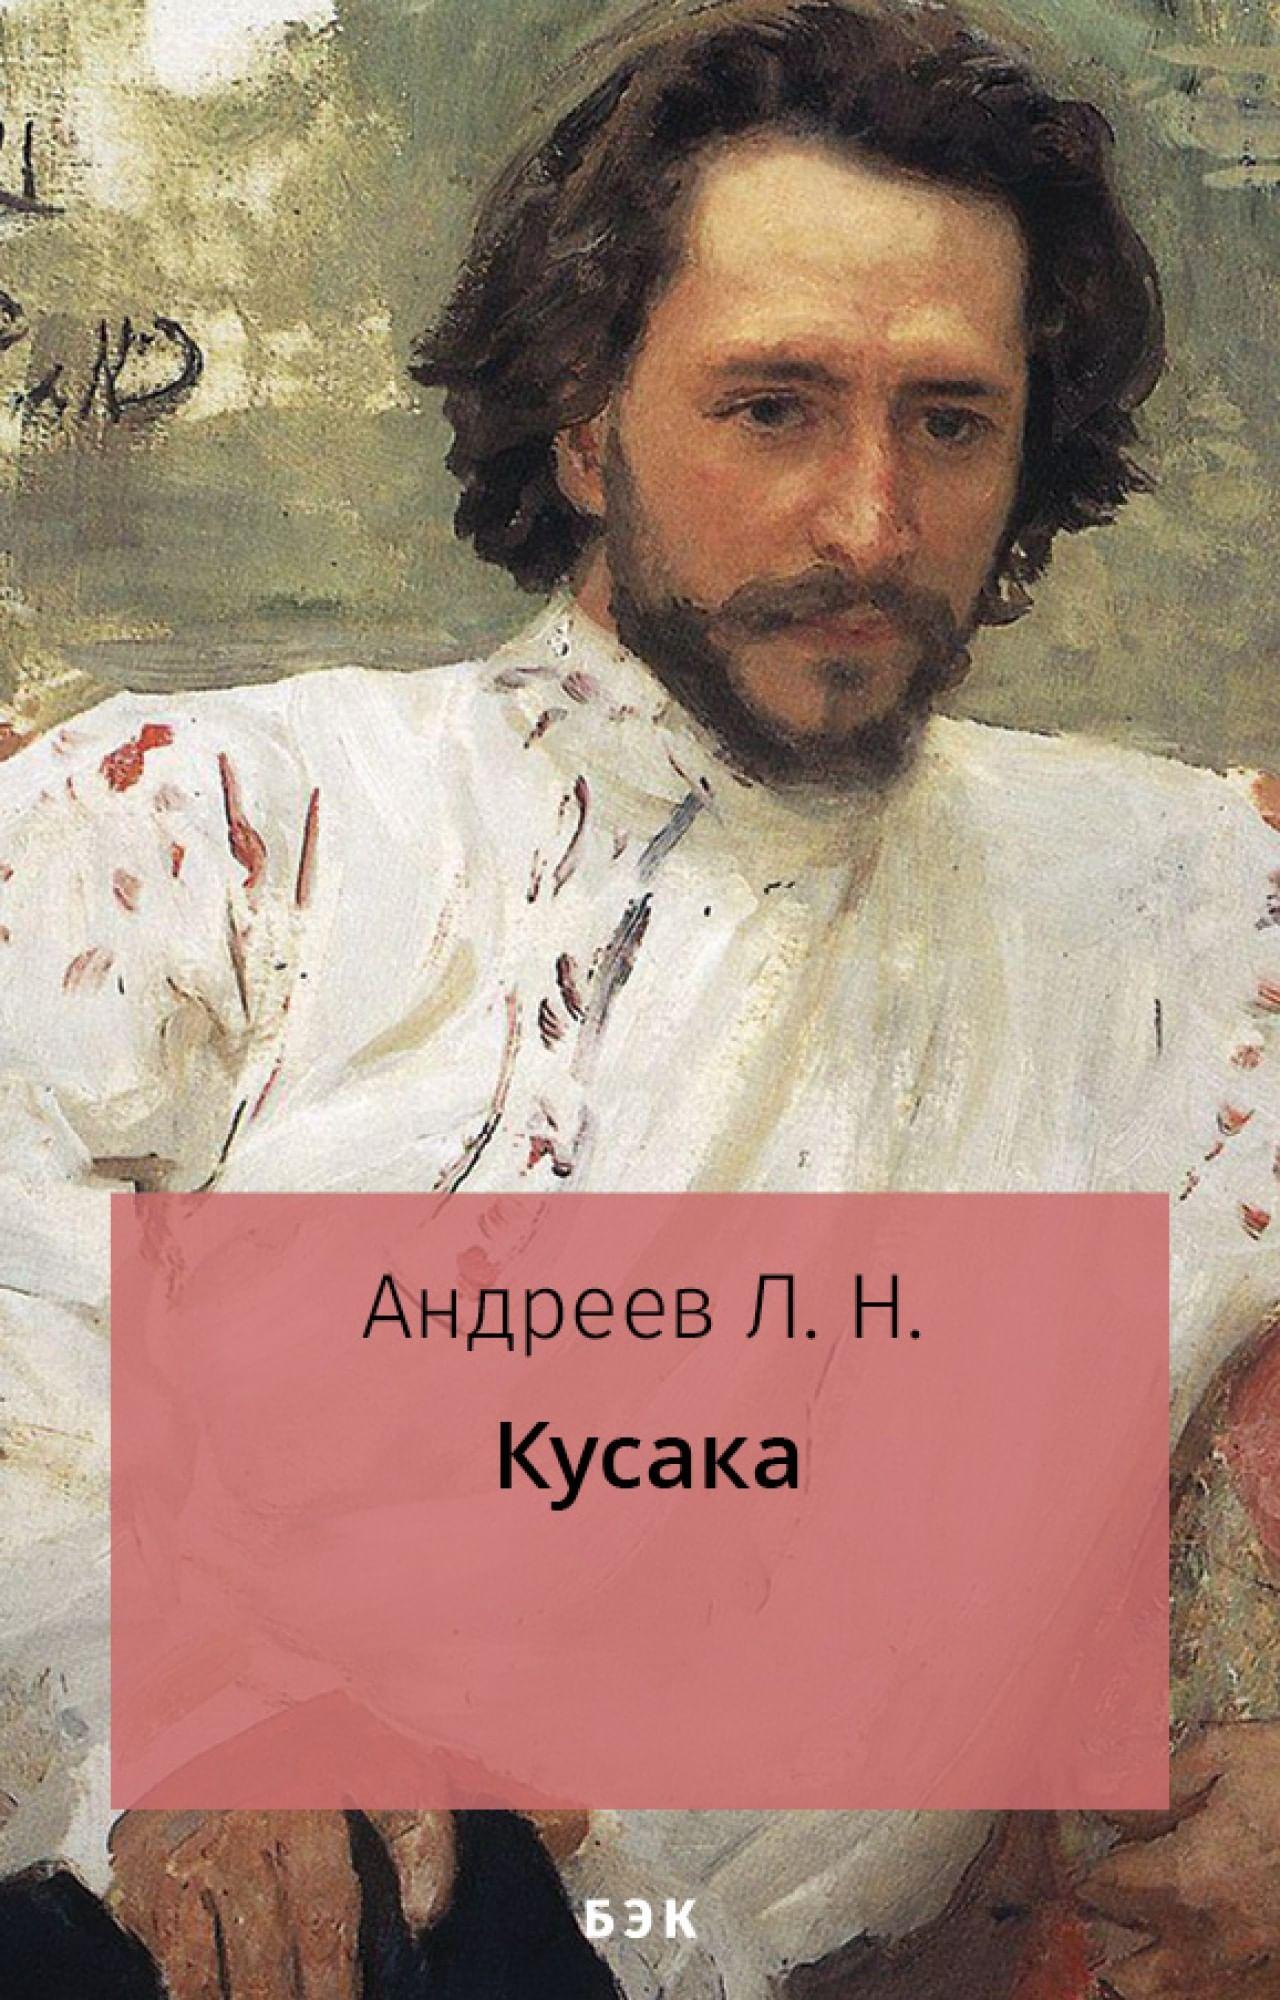 Андреев кусака картинки.